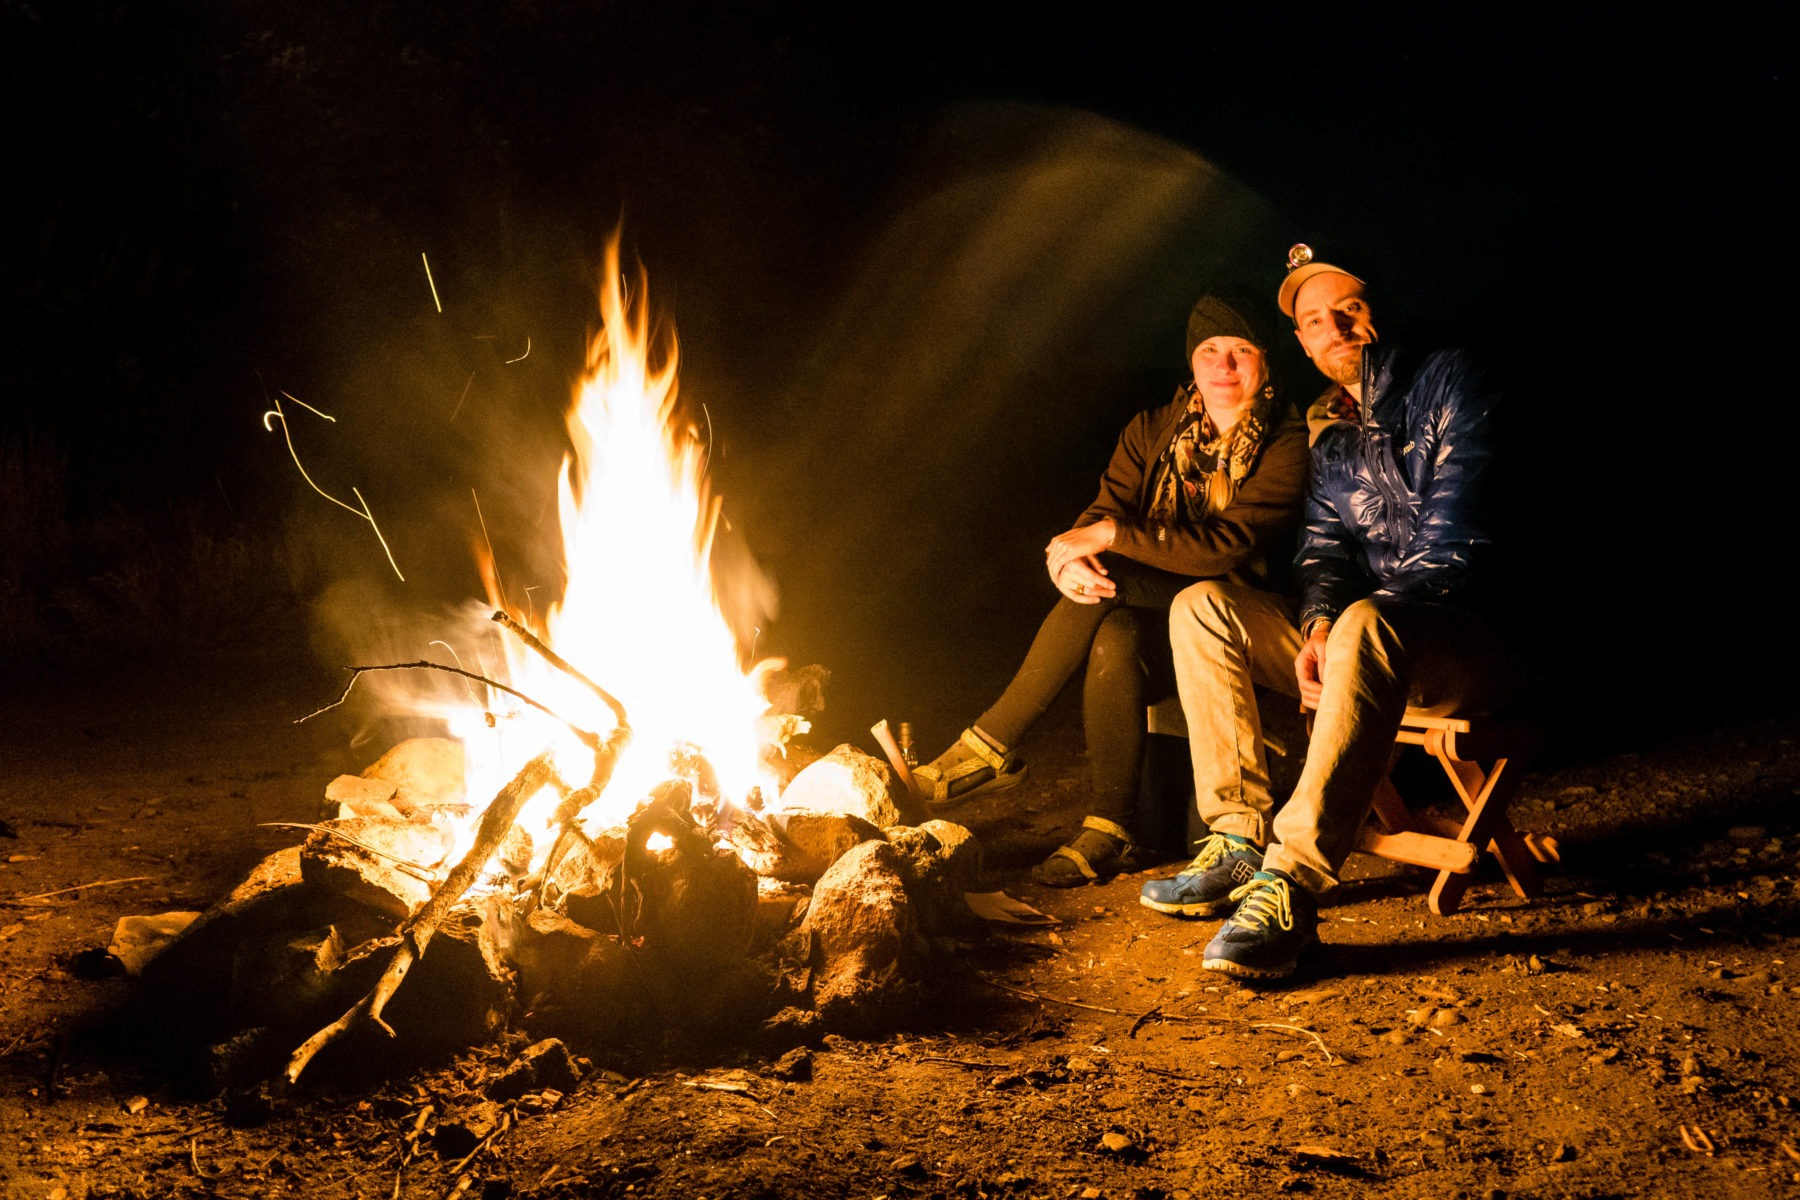 Our campfire at our campsite on Bureau of Land Management Land